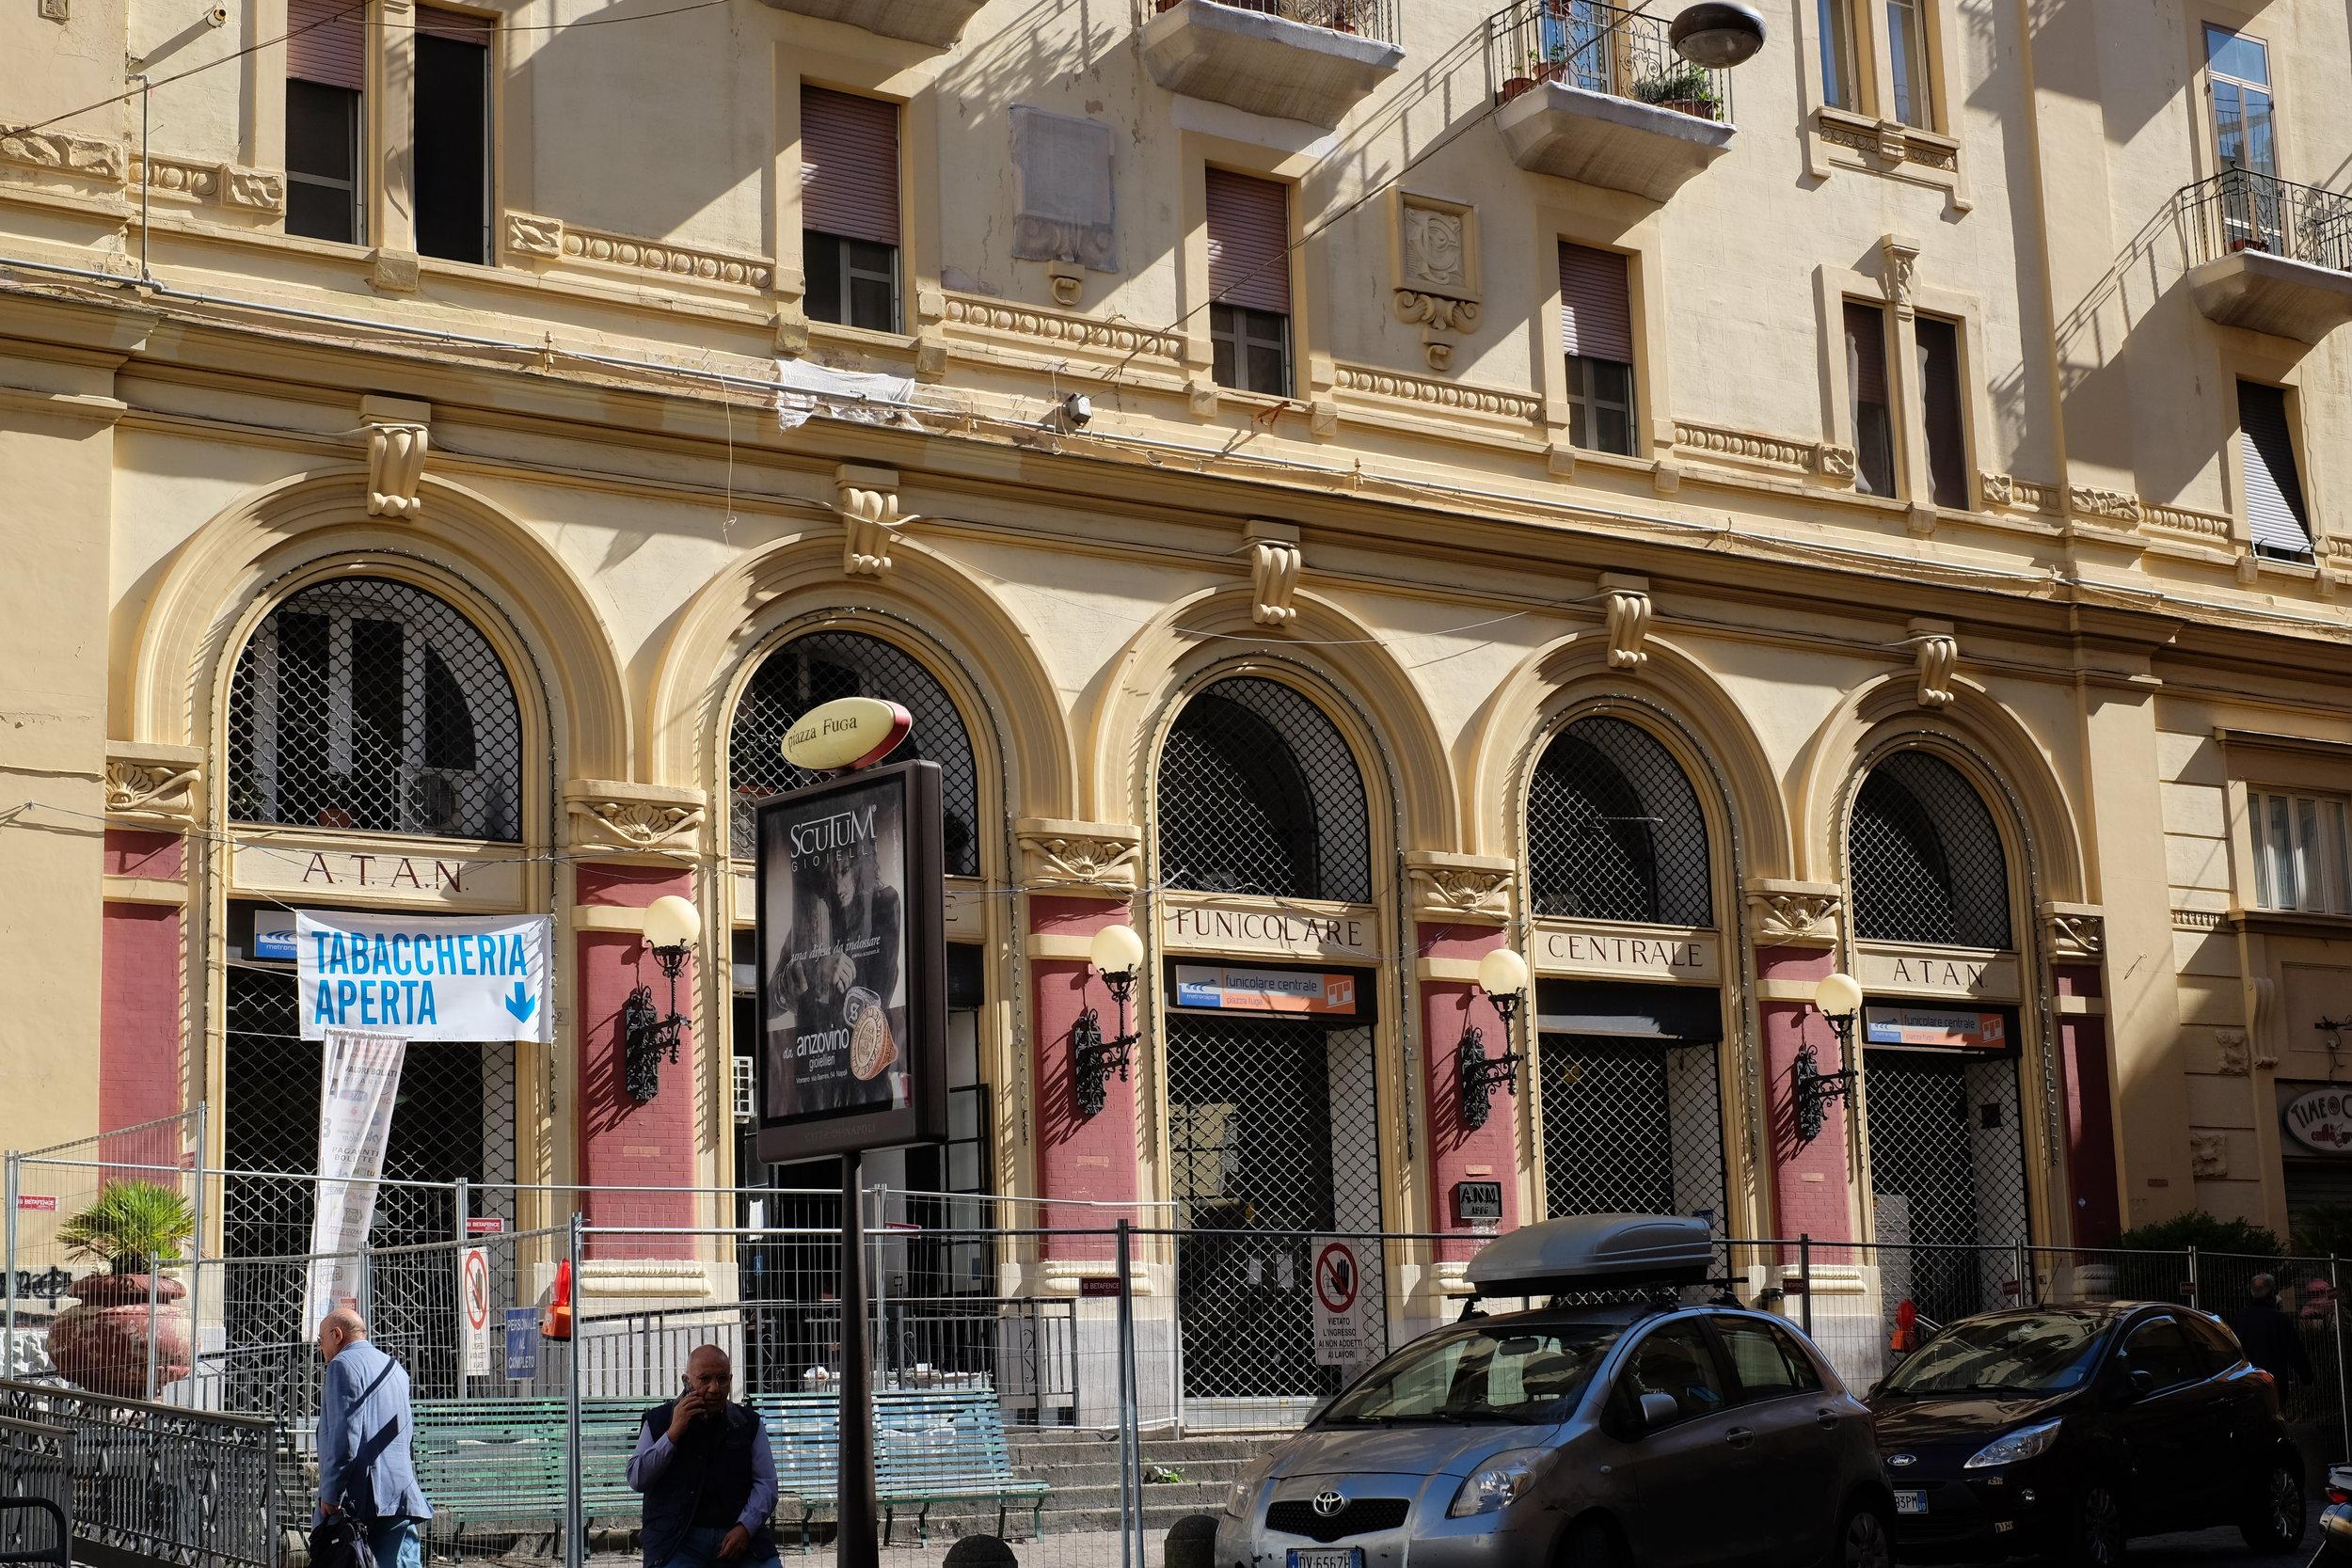 Funicolare centrale at Piazza Fuga. Temporary closed until June 2017.